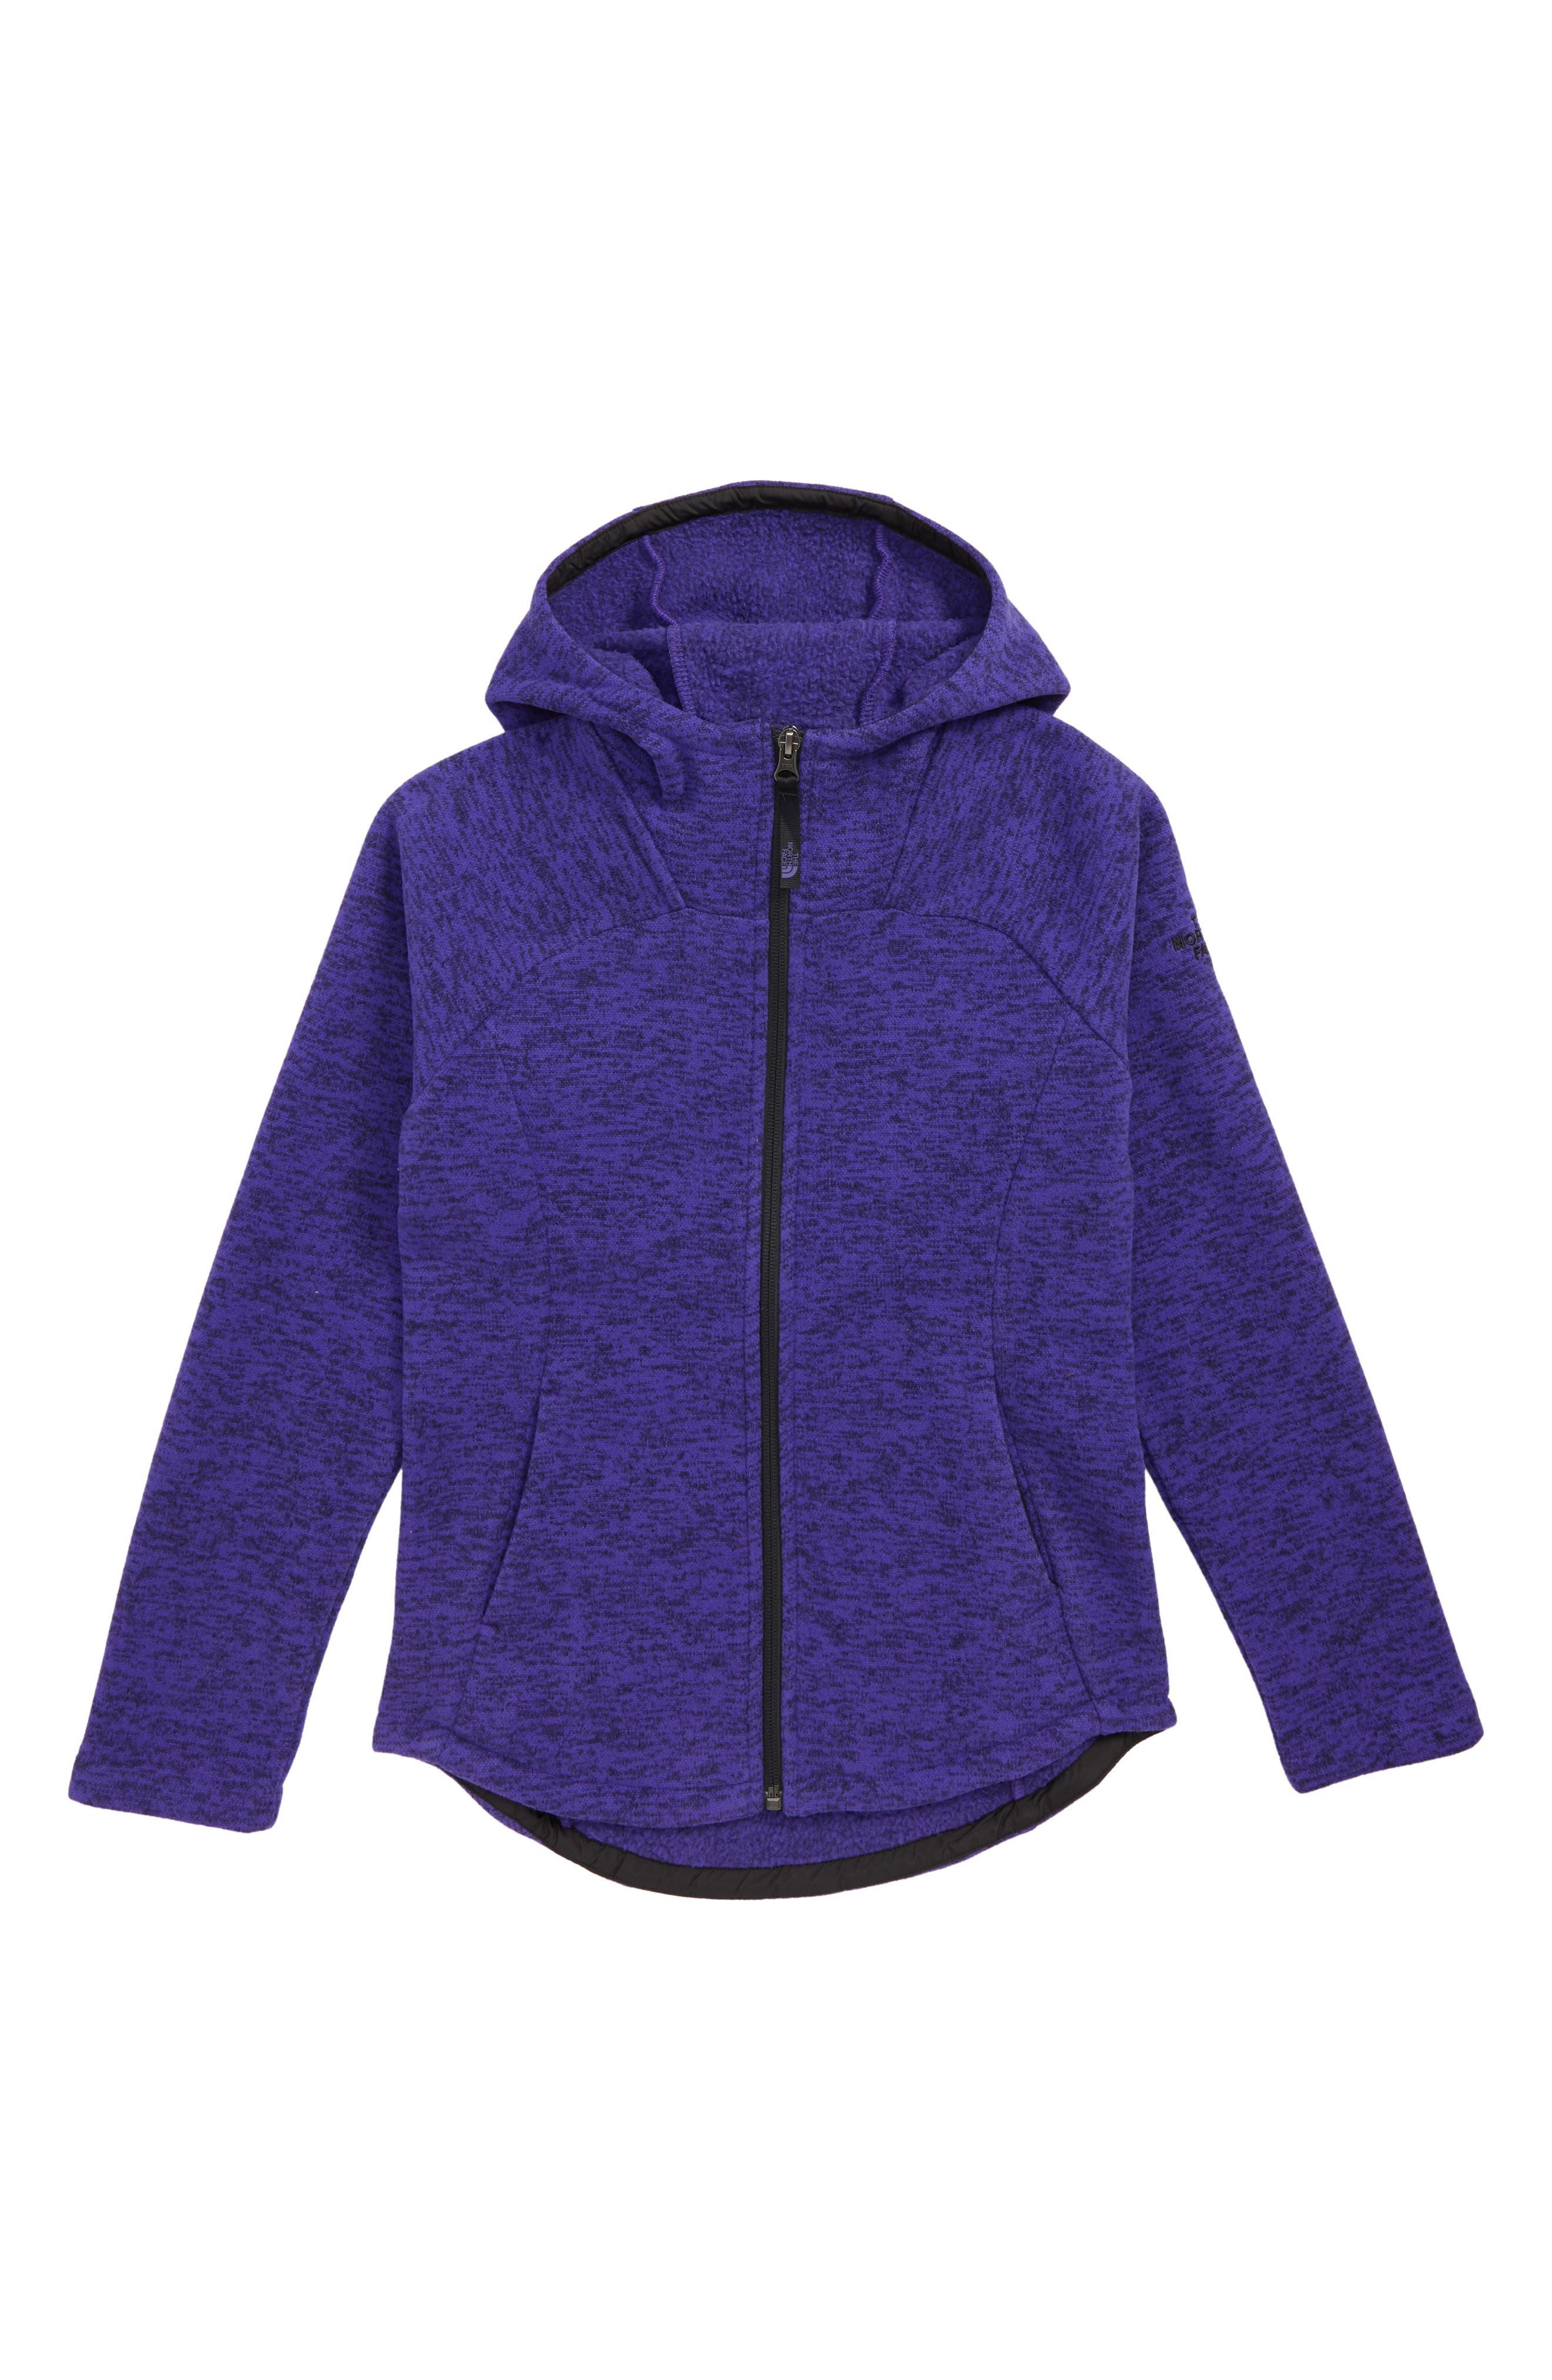 Indi Fleece Jacket,                         Main,                         color, DEEP BLUE HEATHER